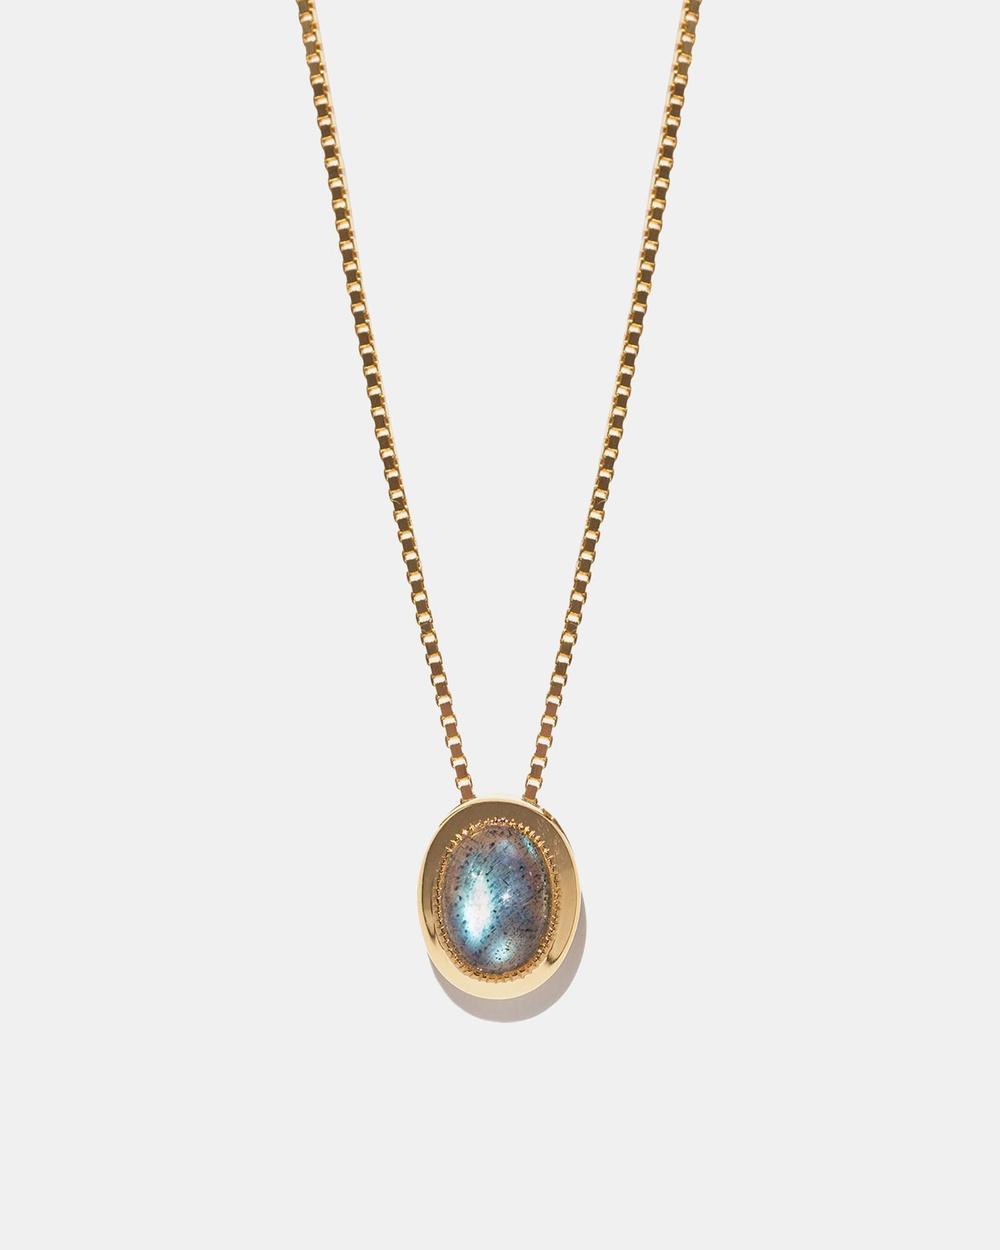 Aletheia & Phos Estelle Necklace Jewellery Gold Labradorite